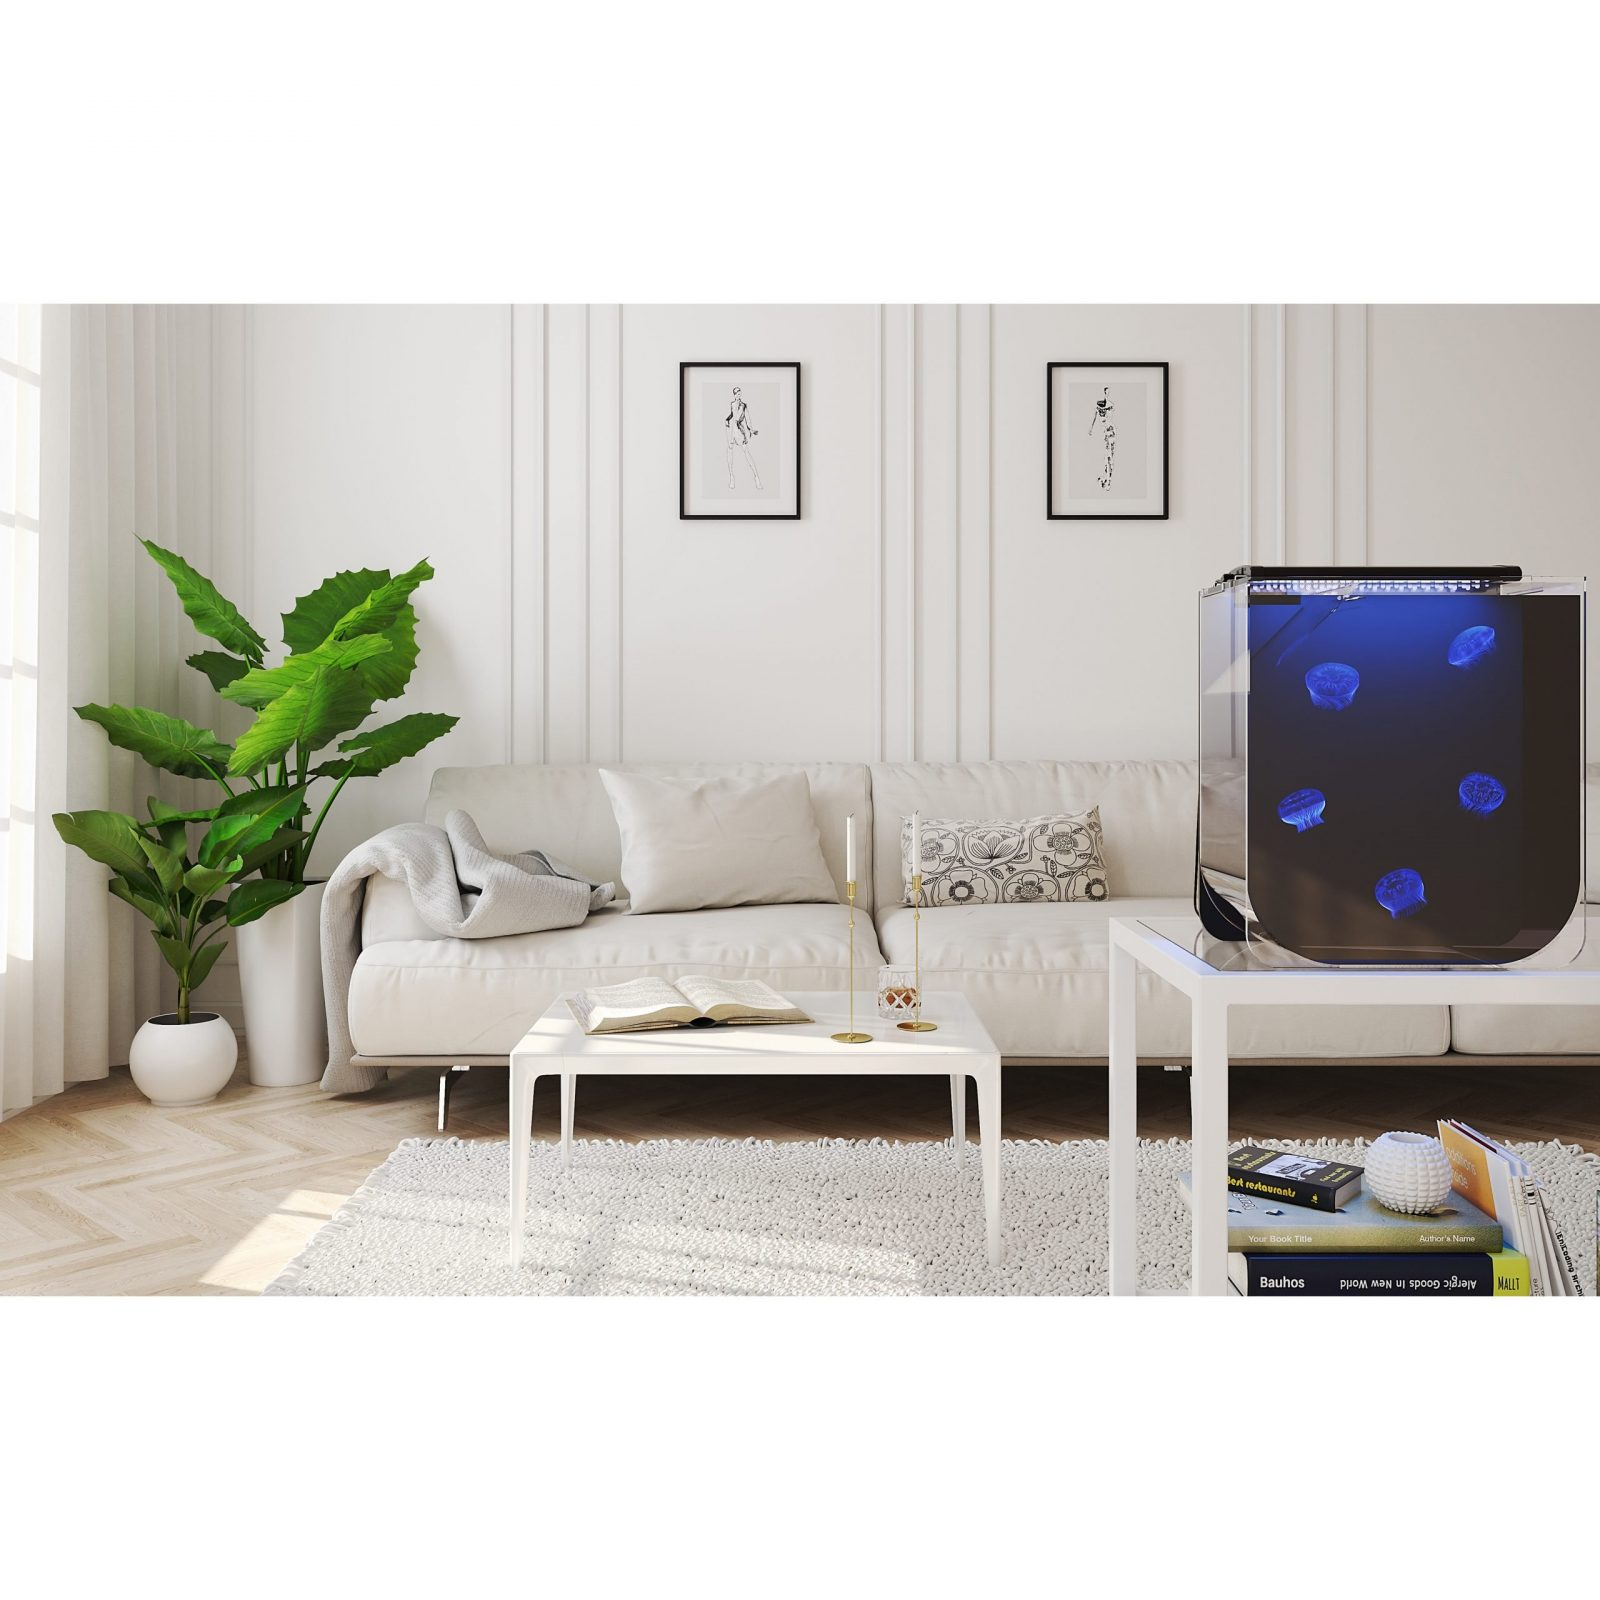 Medusa Mini Jellyfish Aquarium in modern room scene